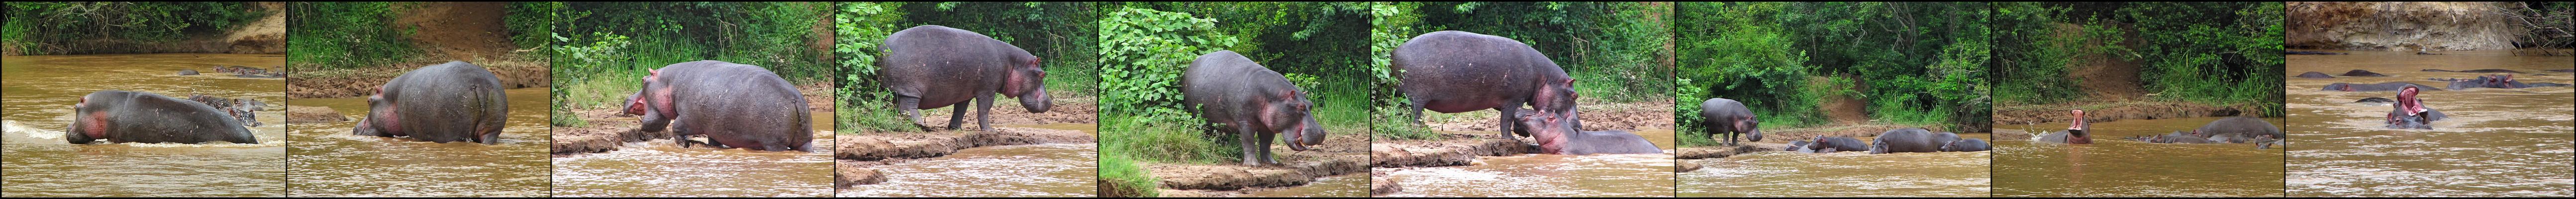 Hippo Paradies